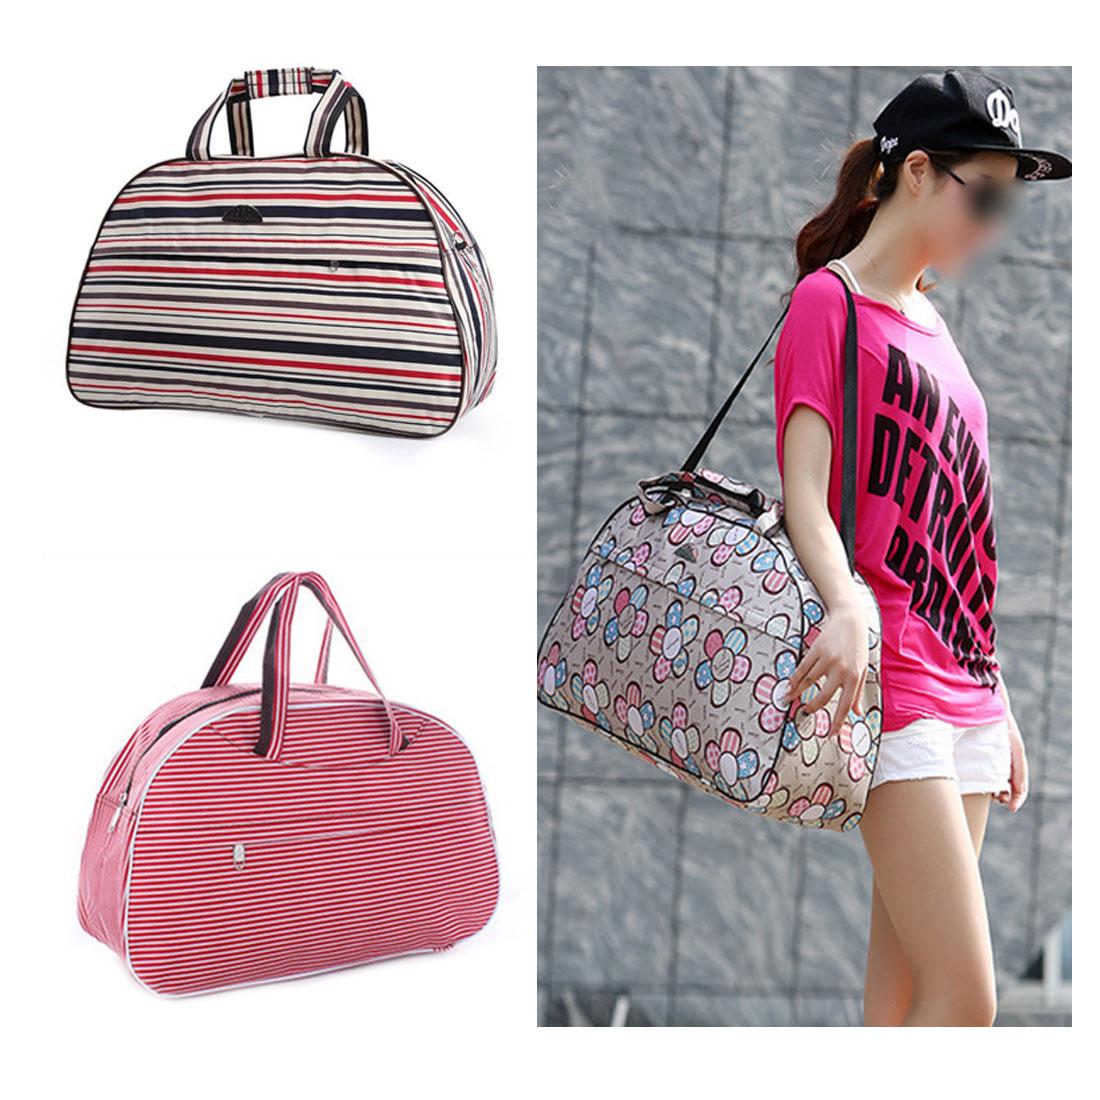 Men Luggage Duffle Bag New Flower Print Female HandBag 41cm*28cm*16cm Cheap Large Capacity Women Travel Bag Tote